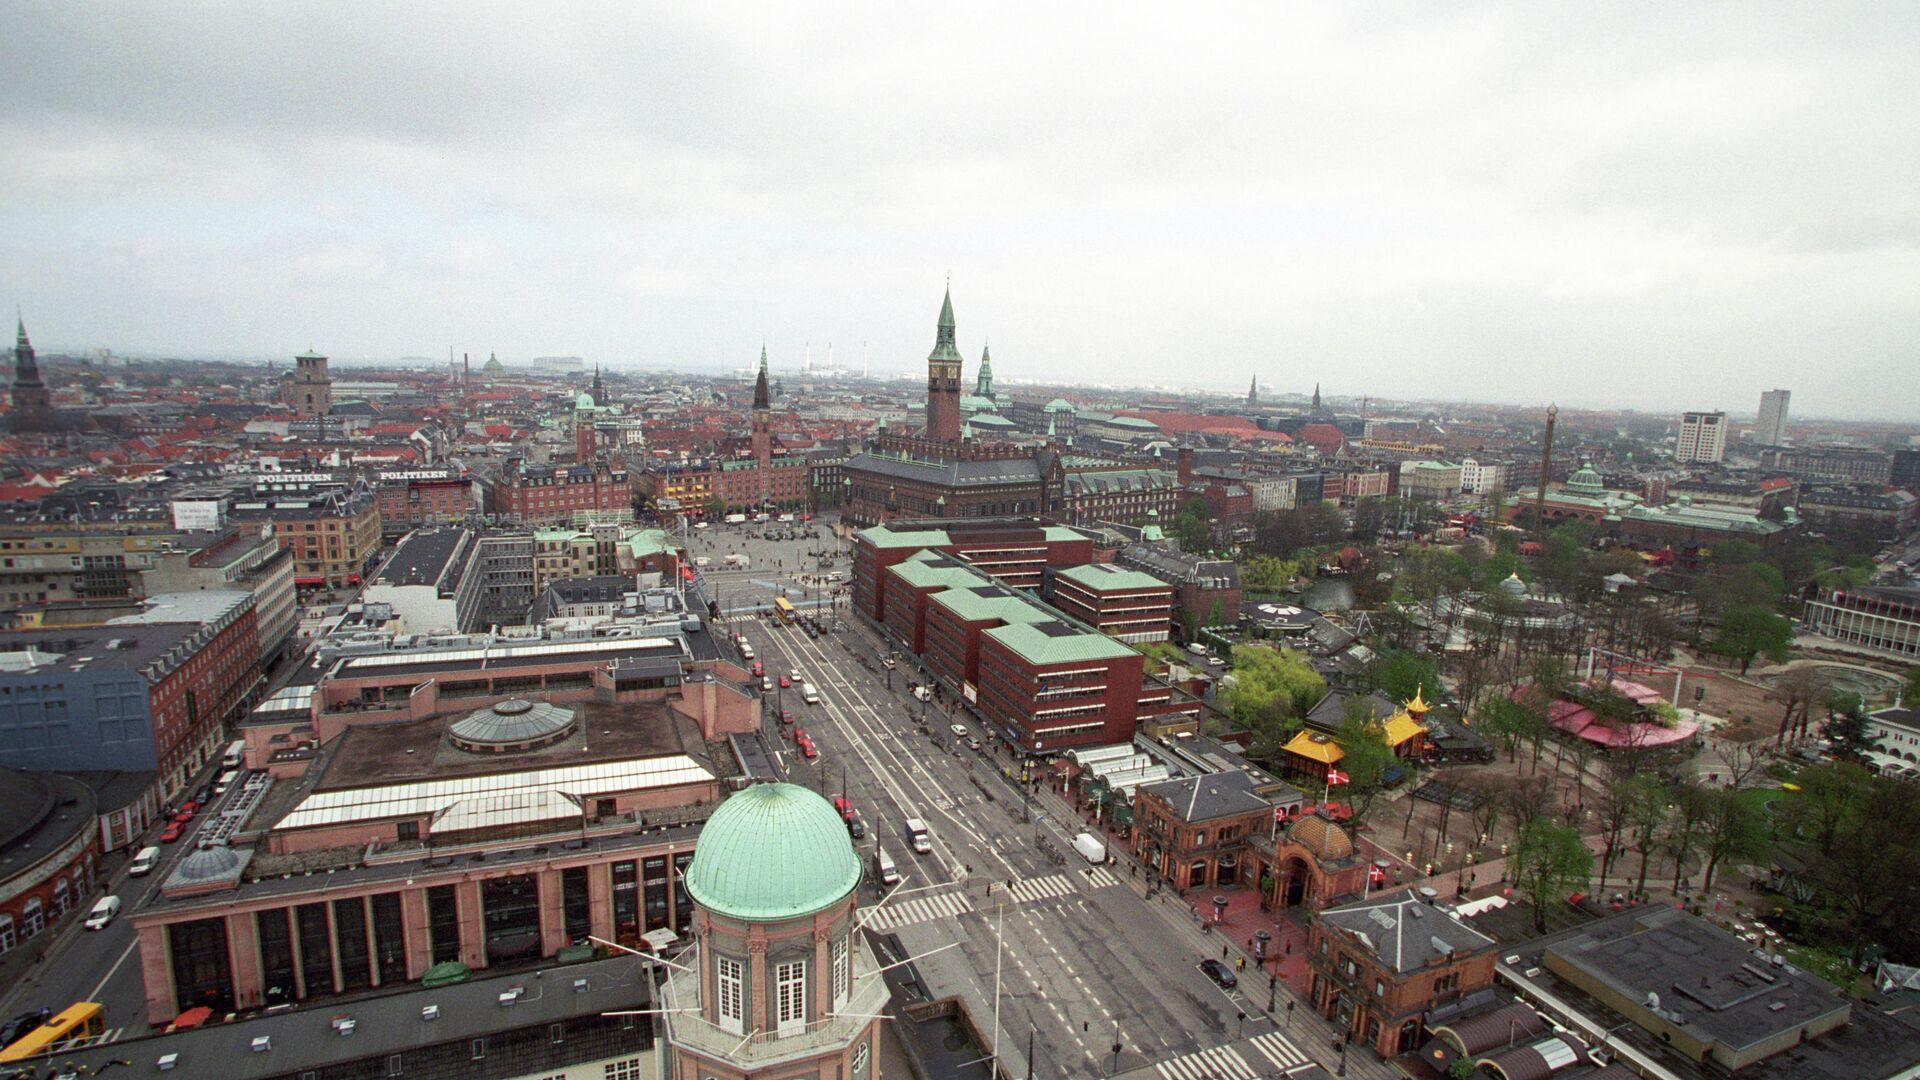 Центр города Копенгаген - РИА Новости, 1920, 29.09.2020